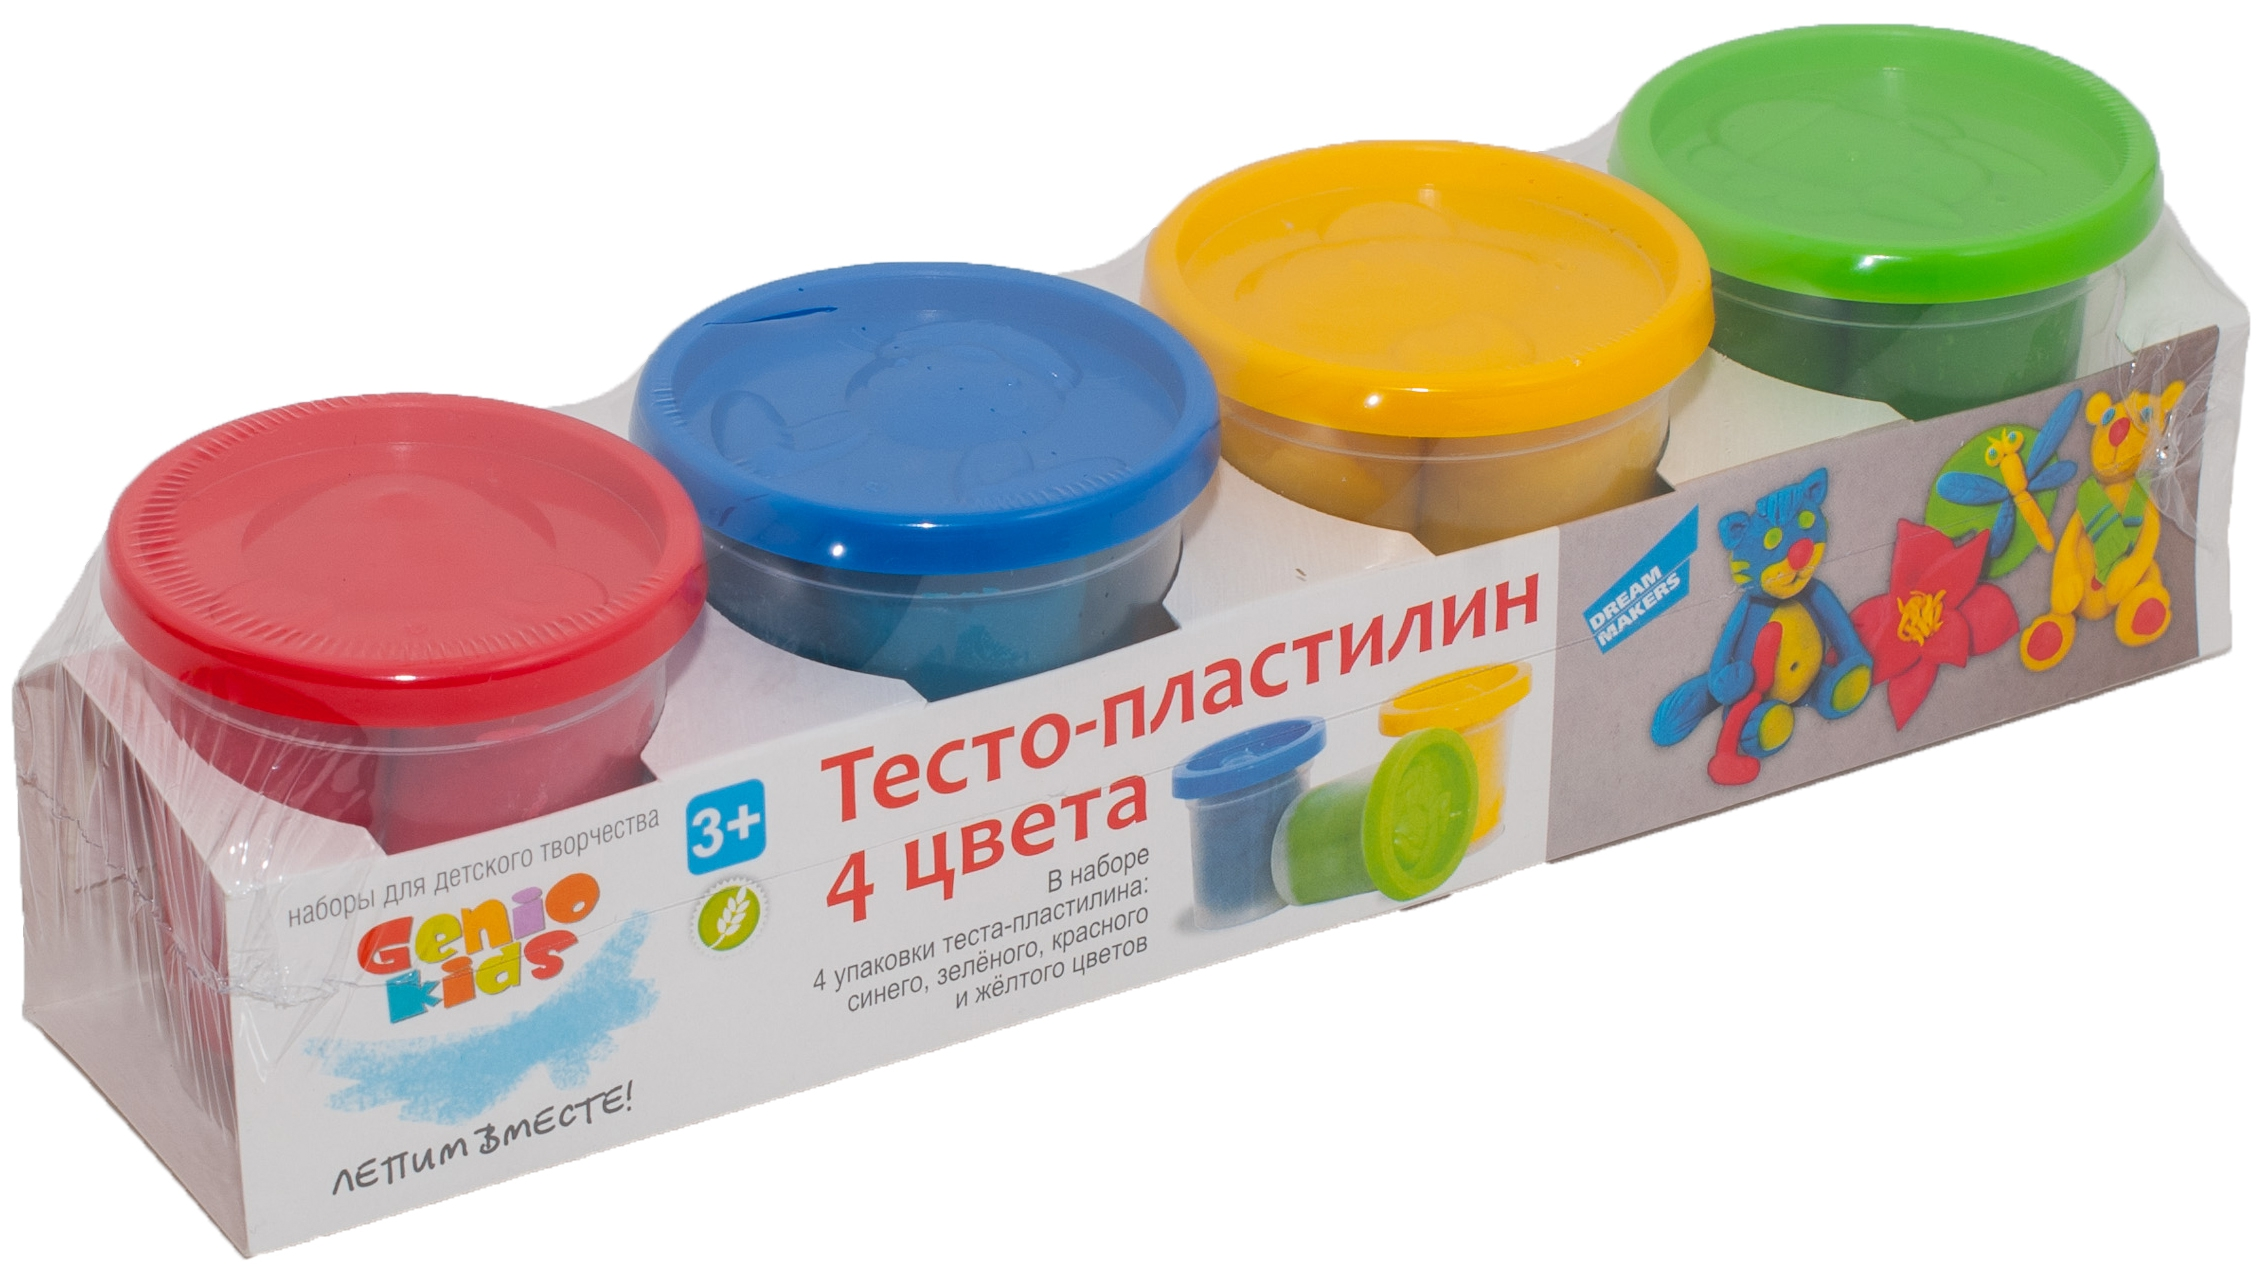 Пластилин для твочество Genio kids Тесто-пластилин 4 цвета genio kids набор для детского творчества собачка